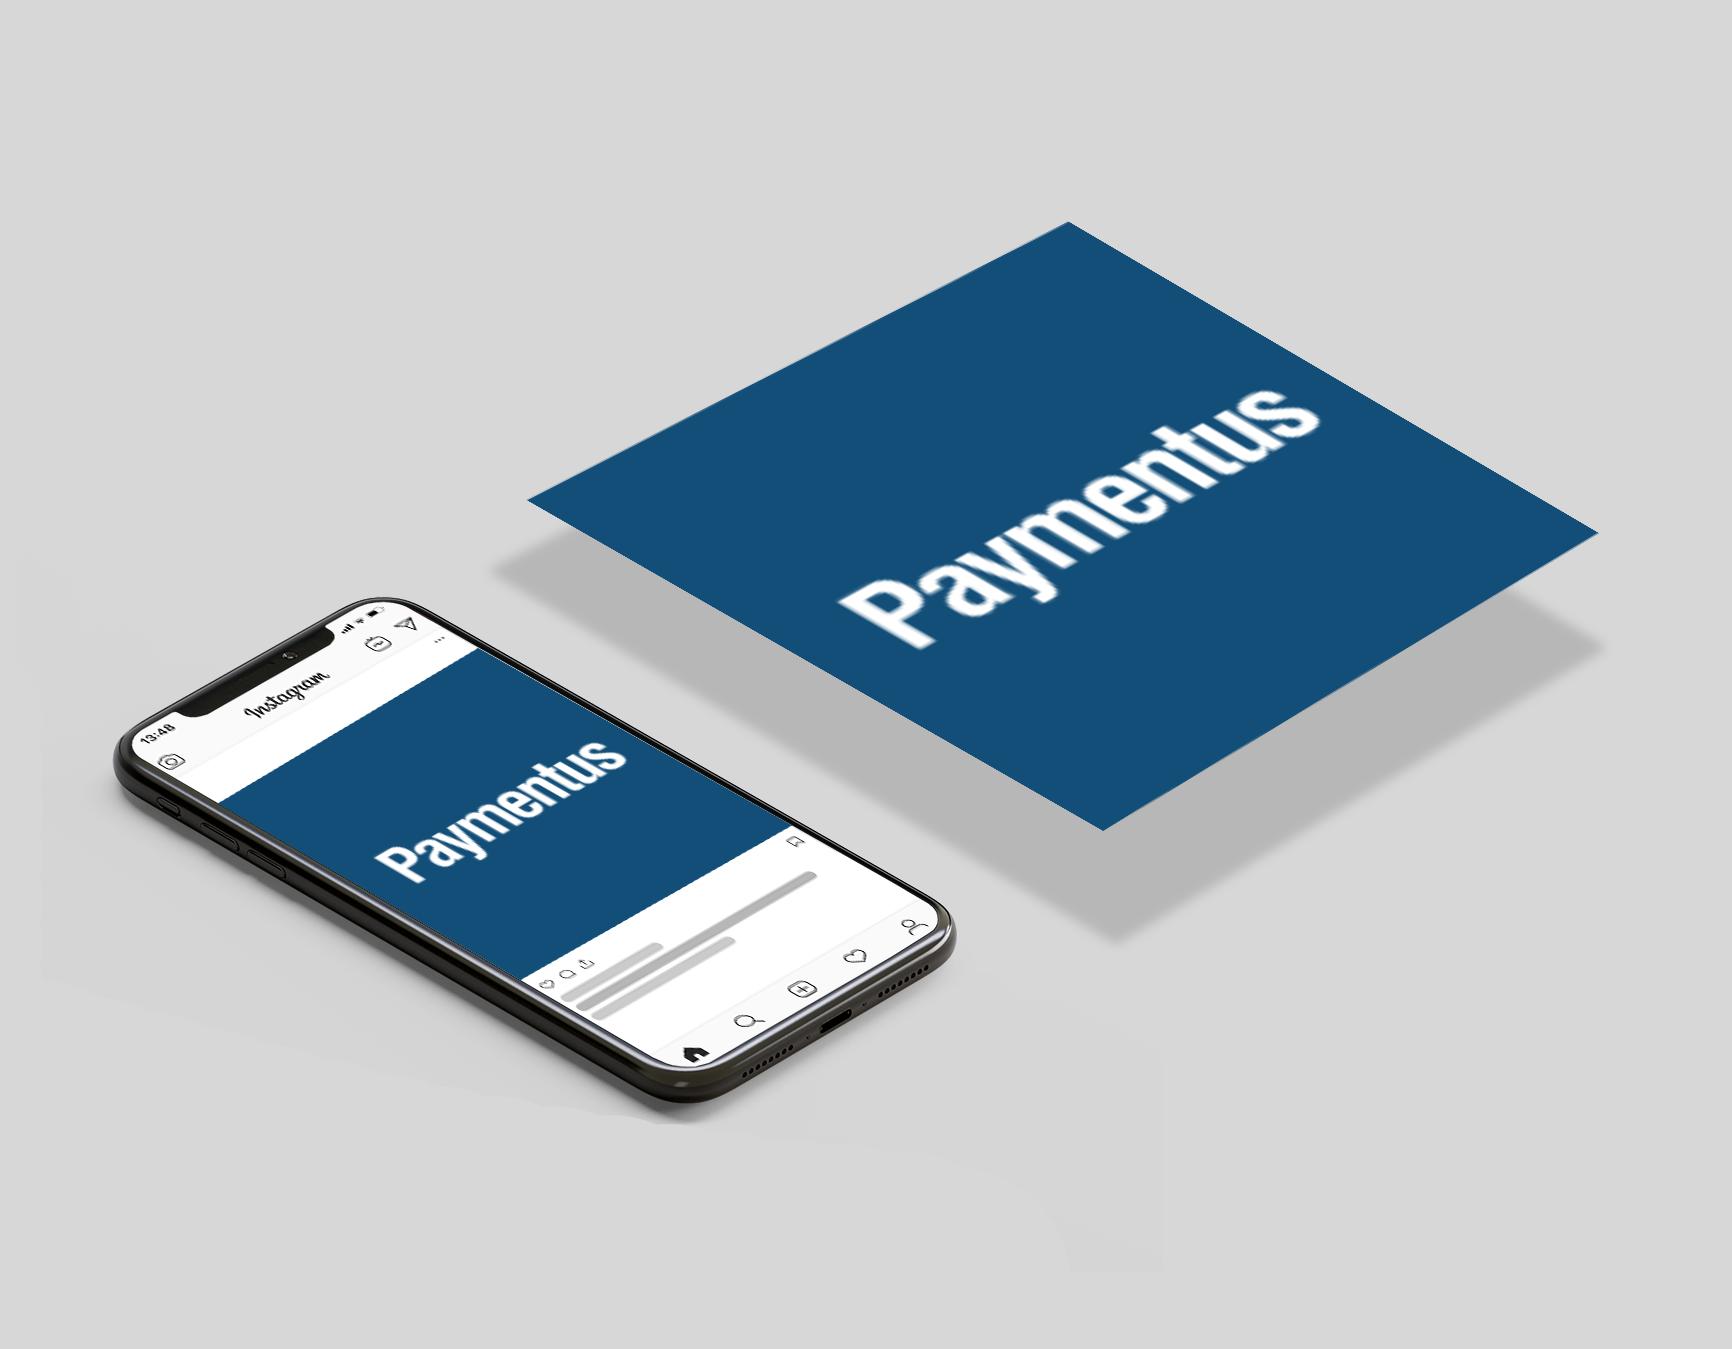 Paymentus Initial Public Offering